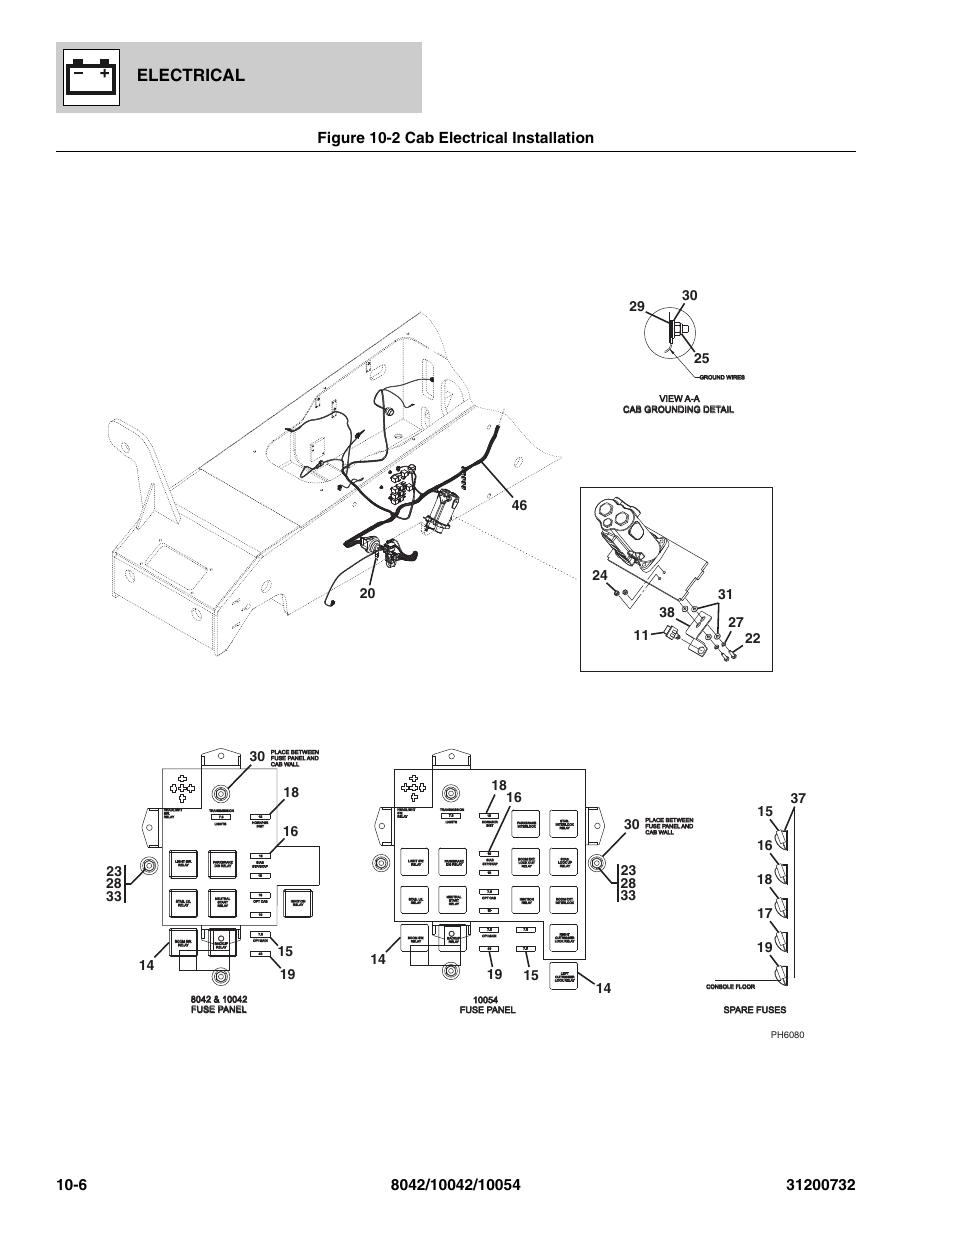 Parts Manual Skyjack 8042 Jbod Wiring Diagram Figure 10 2 Cab Electrical Installation Rh Manualsdir Com Lifts Skytrak Telehandler